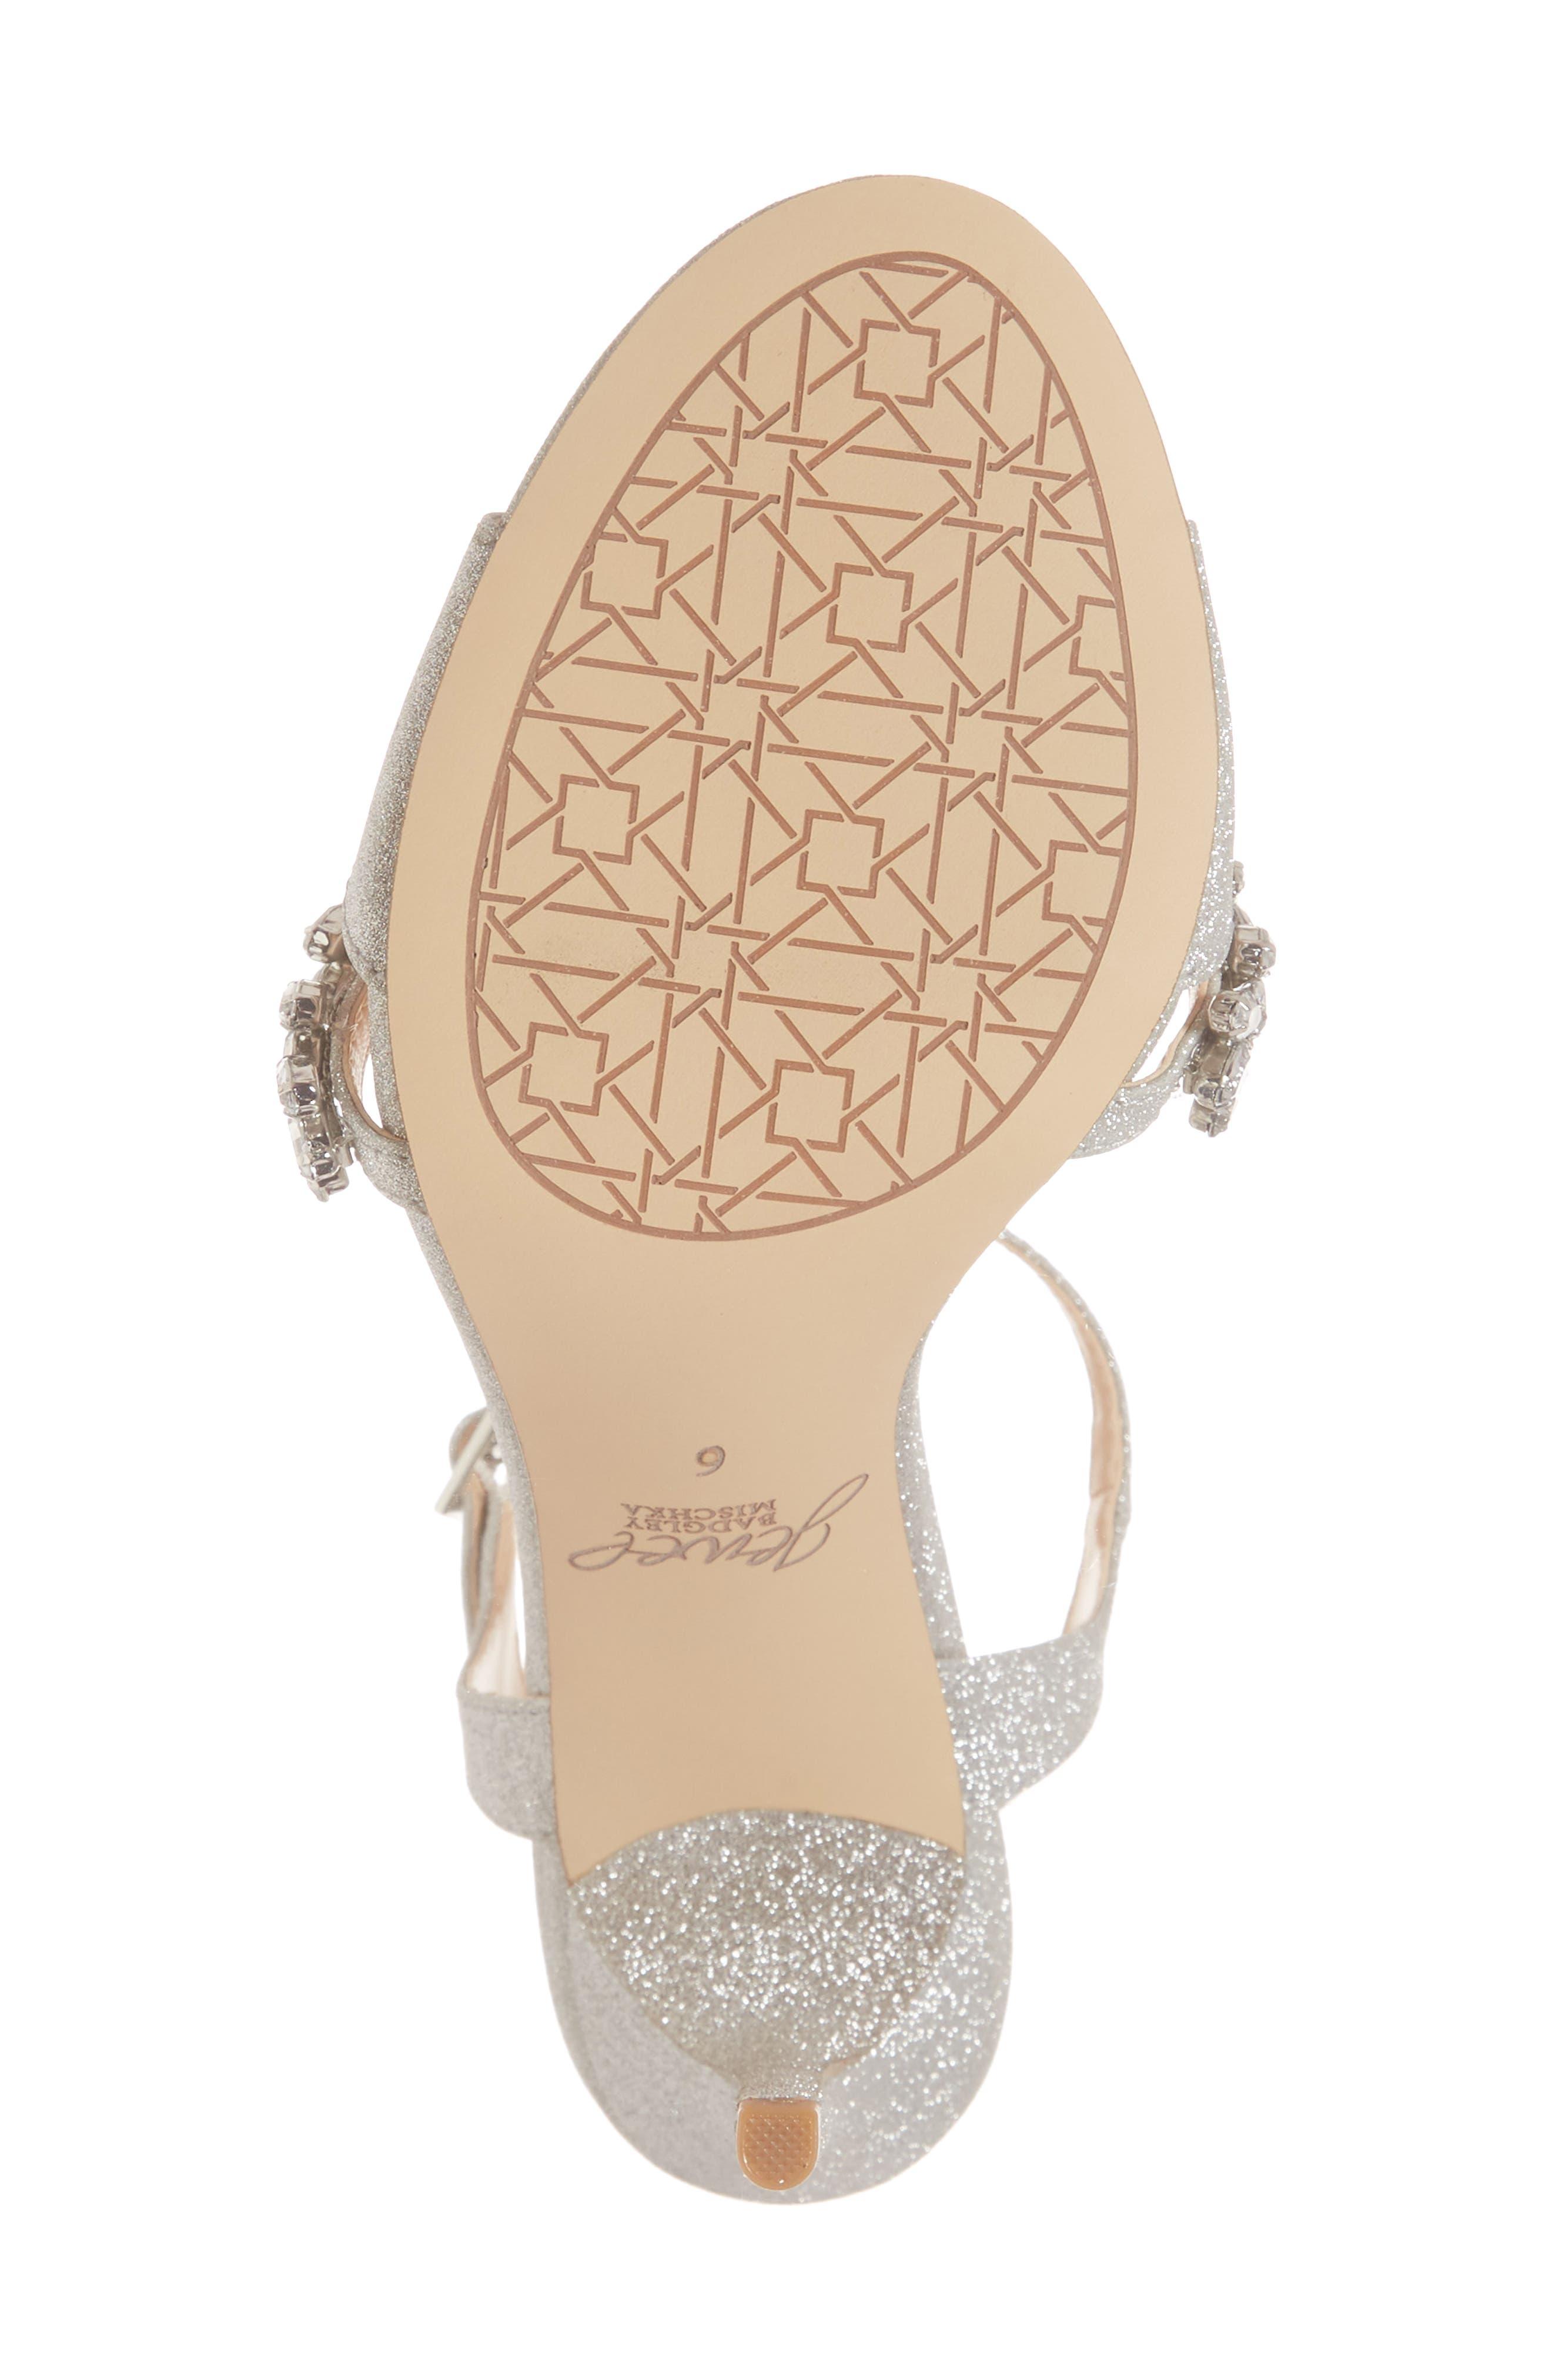 JEWEL BADGLEY MISCHKA, Maxi Crystal Embellished Sandal, Alternate thumbnail 6, color, SILVER GLITTER FABRIC